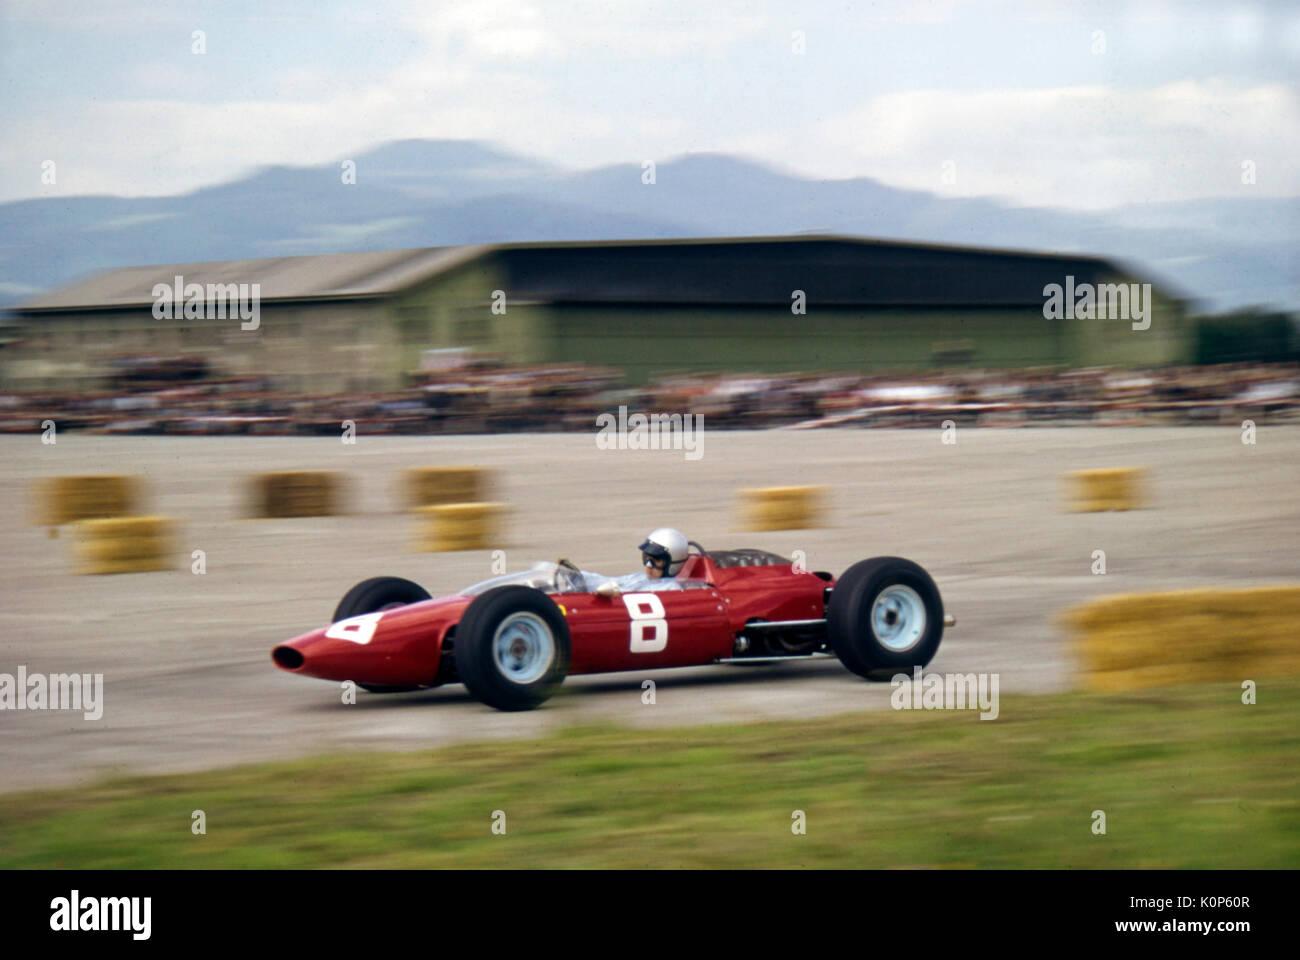 Ferrari 158 Lorenzo Bandini Sieger 1964 Grand Prix Von österreich Stockfotografie Alamy